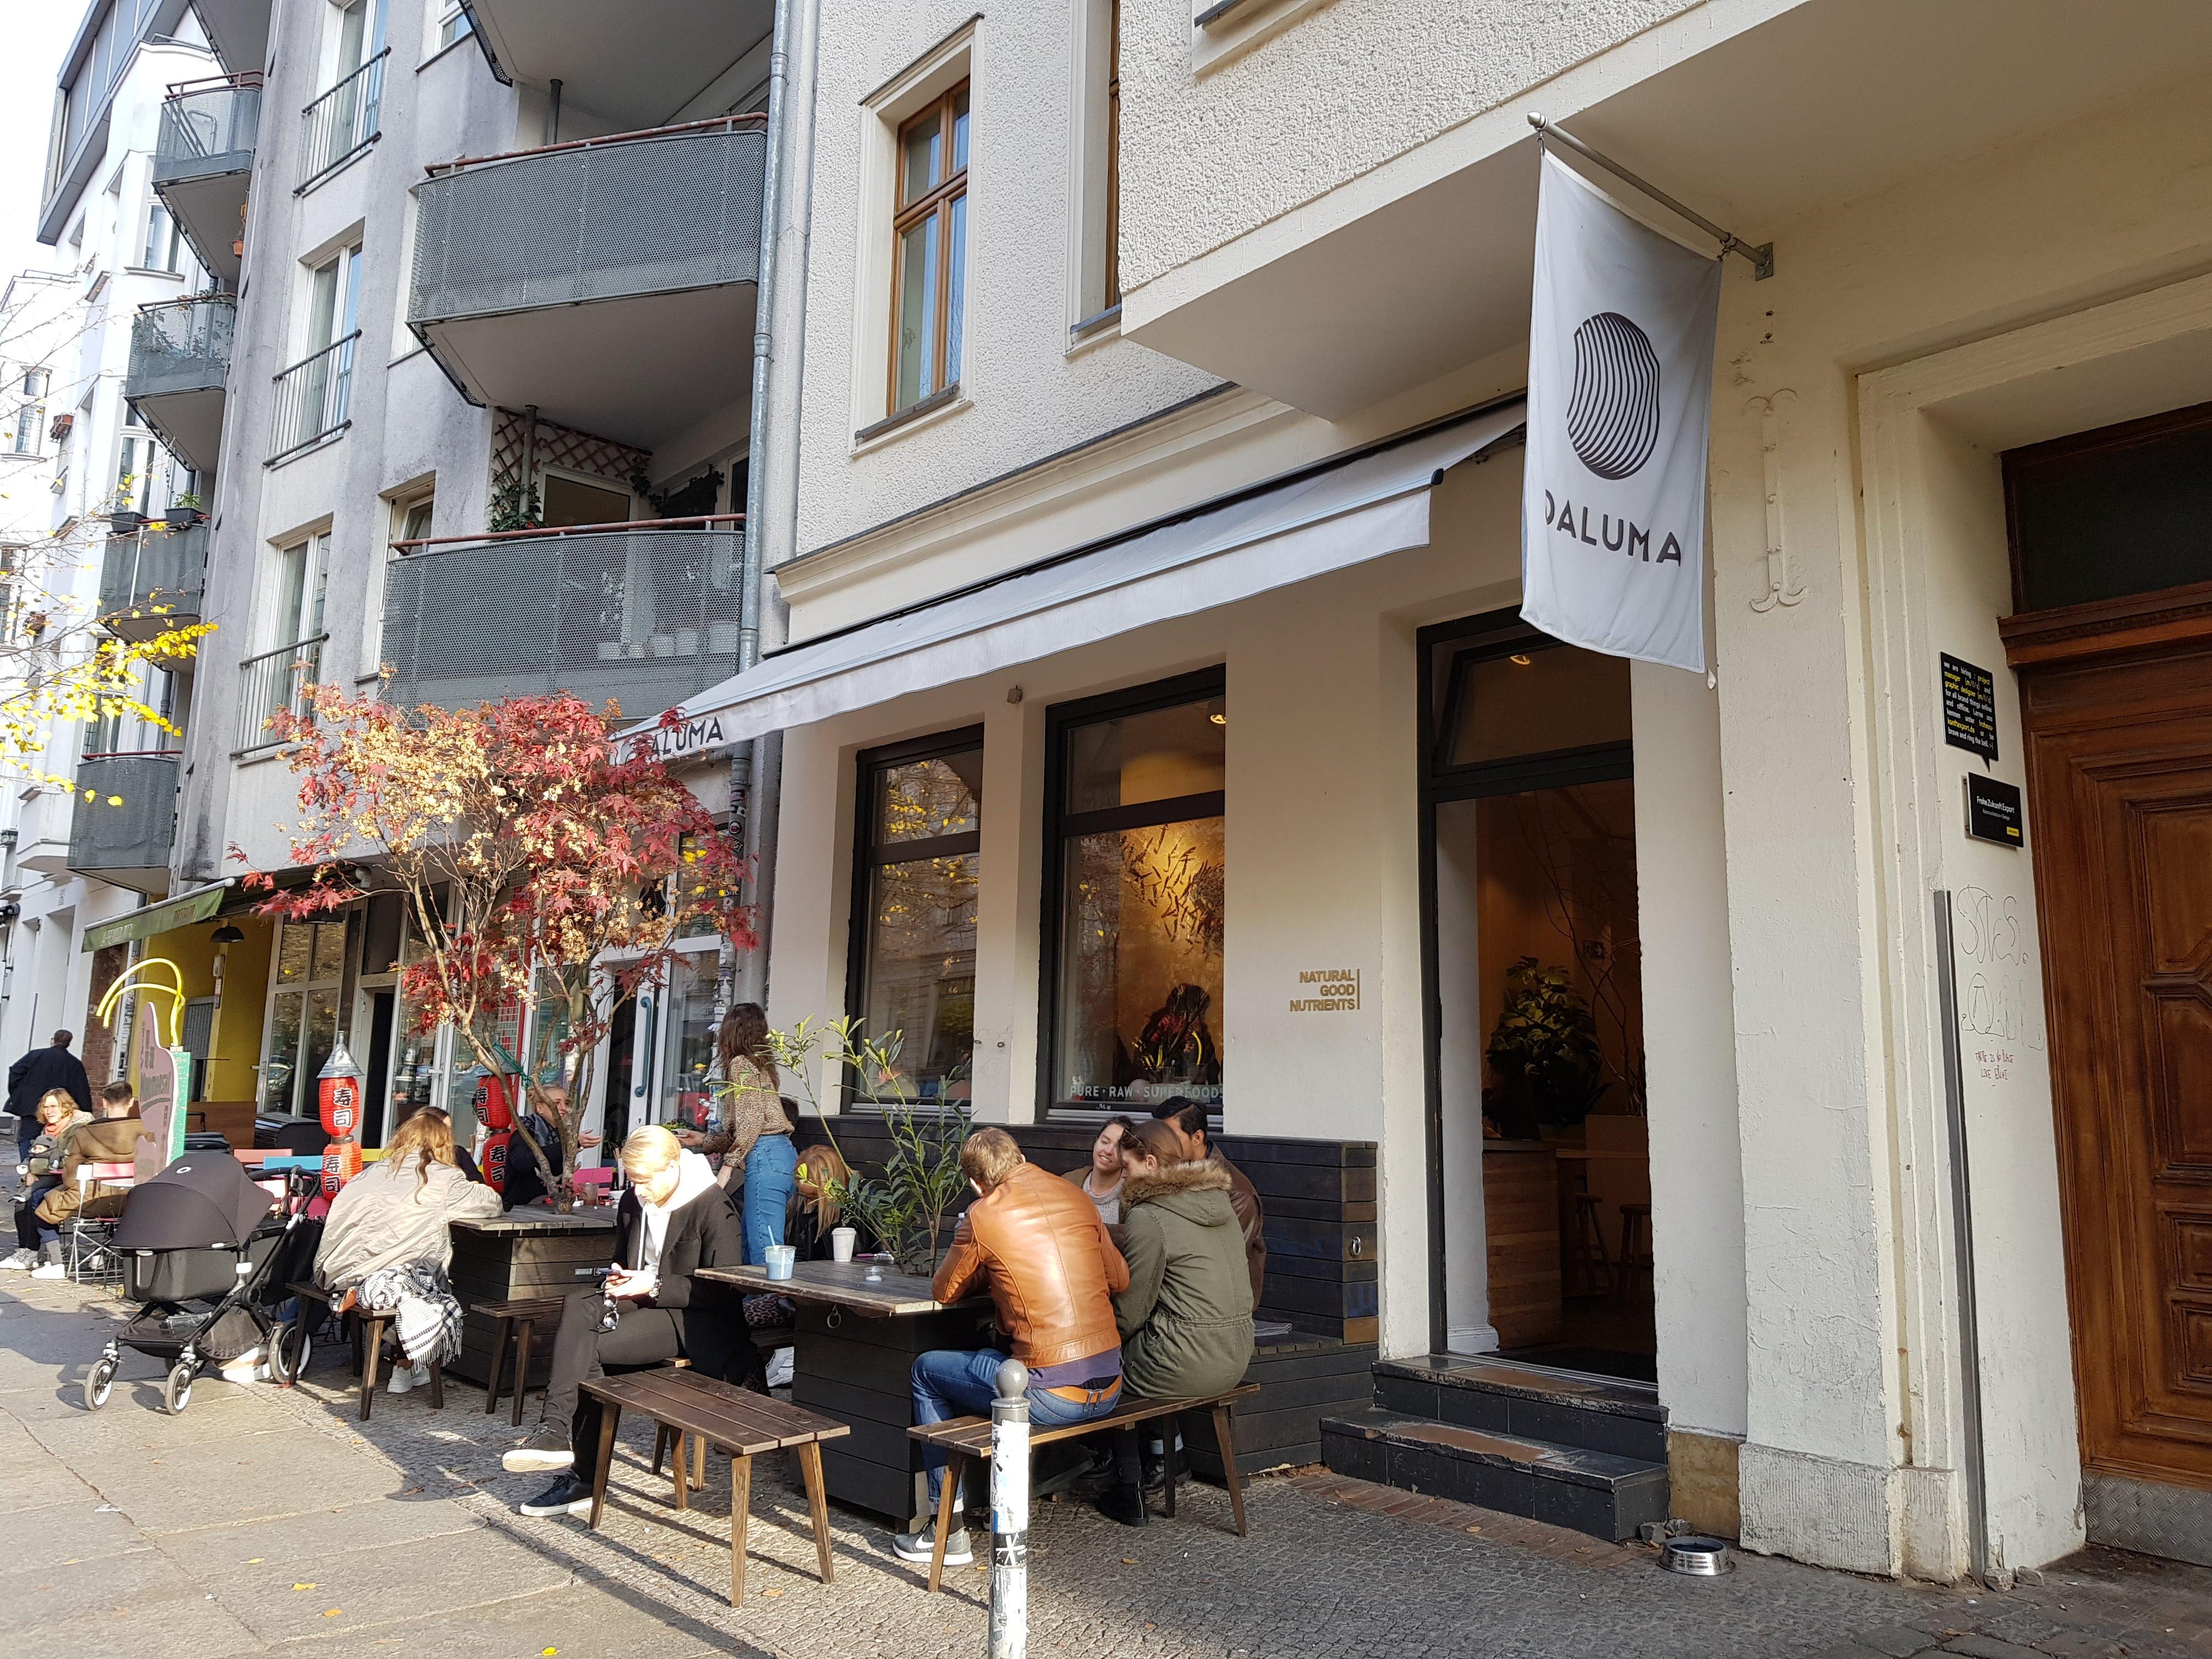 Außenansicht, Daluma, Berlin